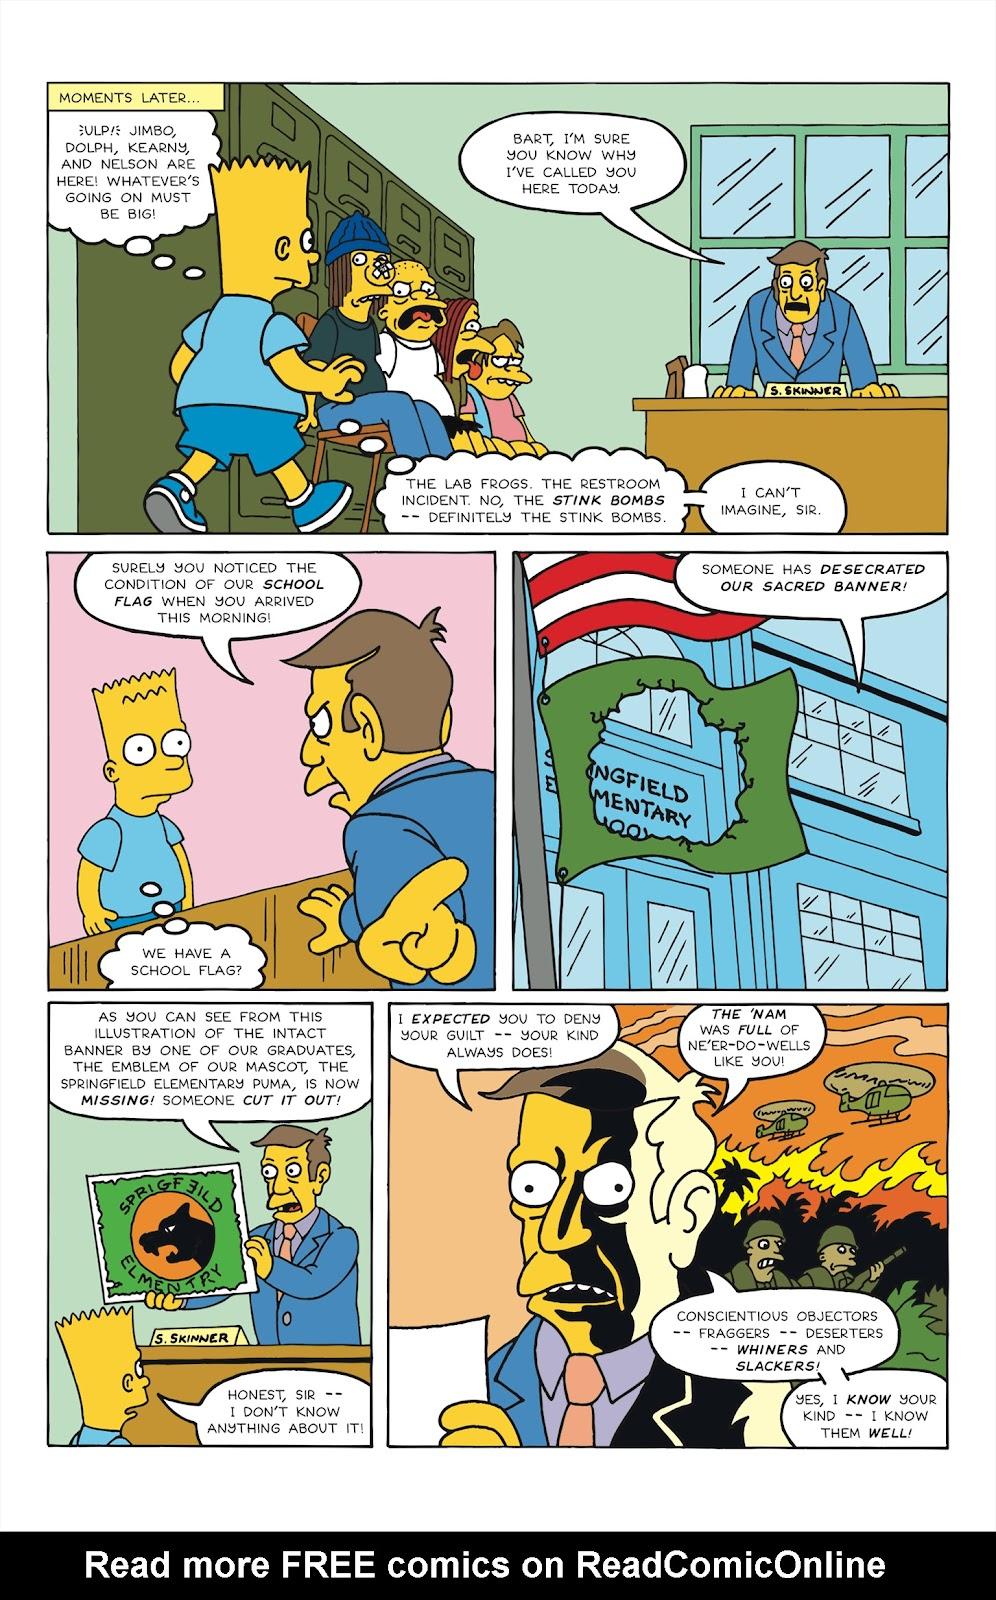 Read online Bartman comic -  Issue #2 - 11